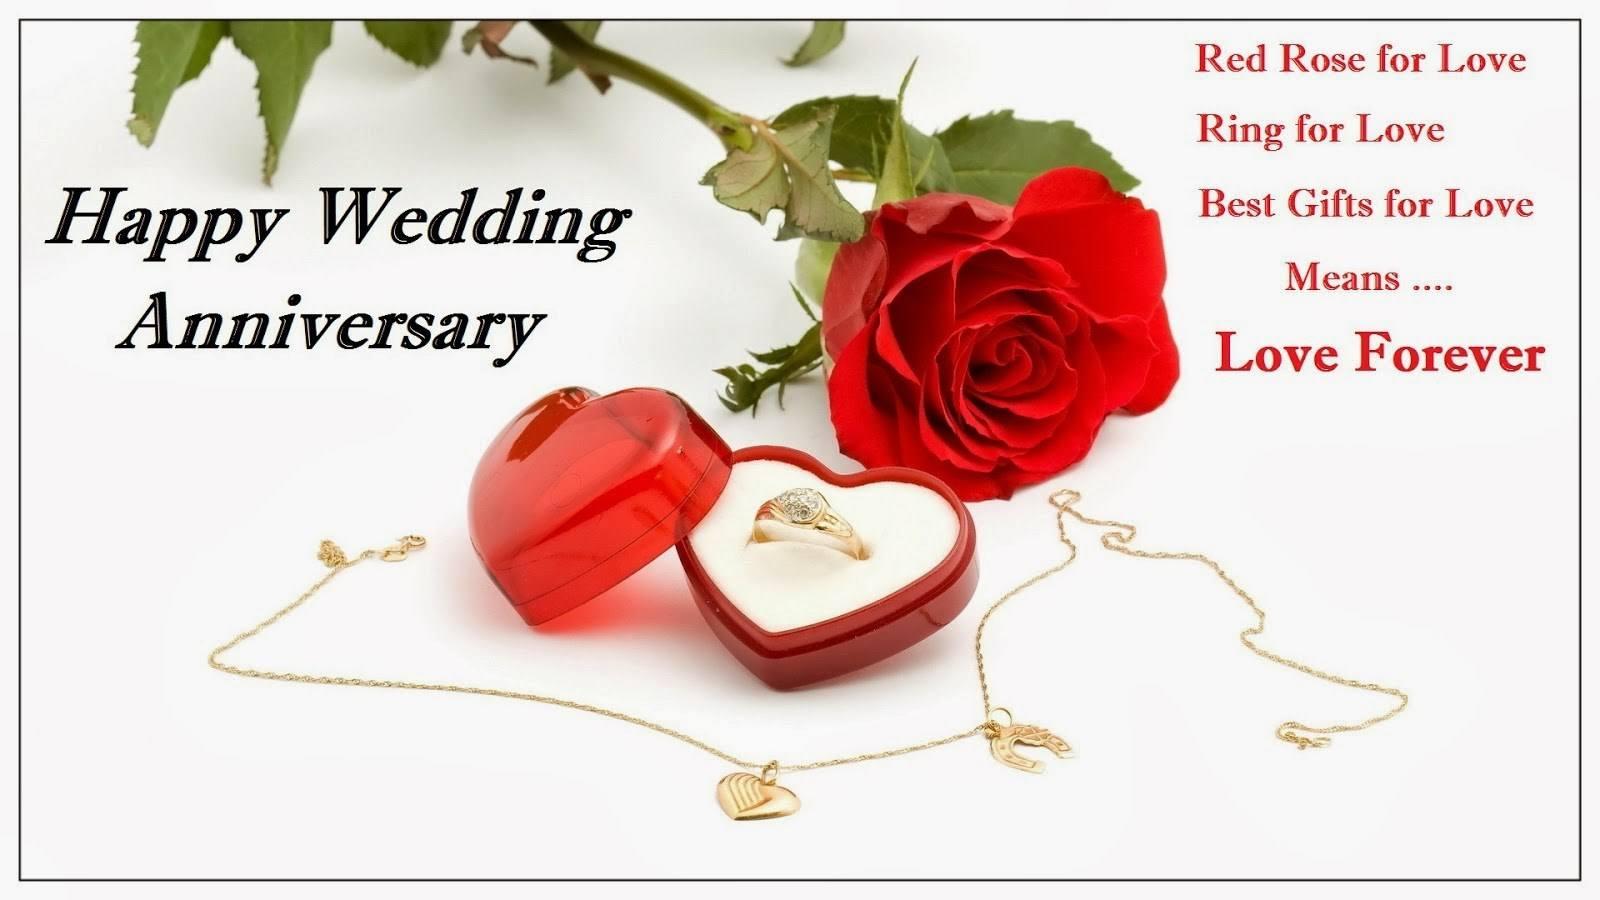 Happy wedding anniversary wishes sms messages for couplesfriends anniversary wishes quotes for couplesfriends m4hsunfo